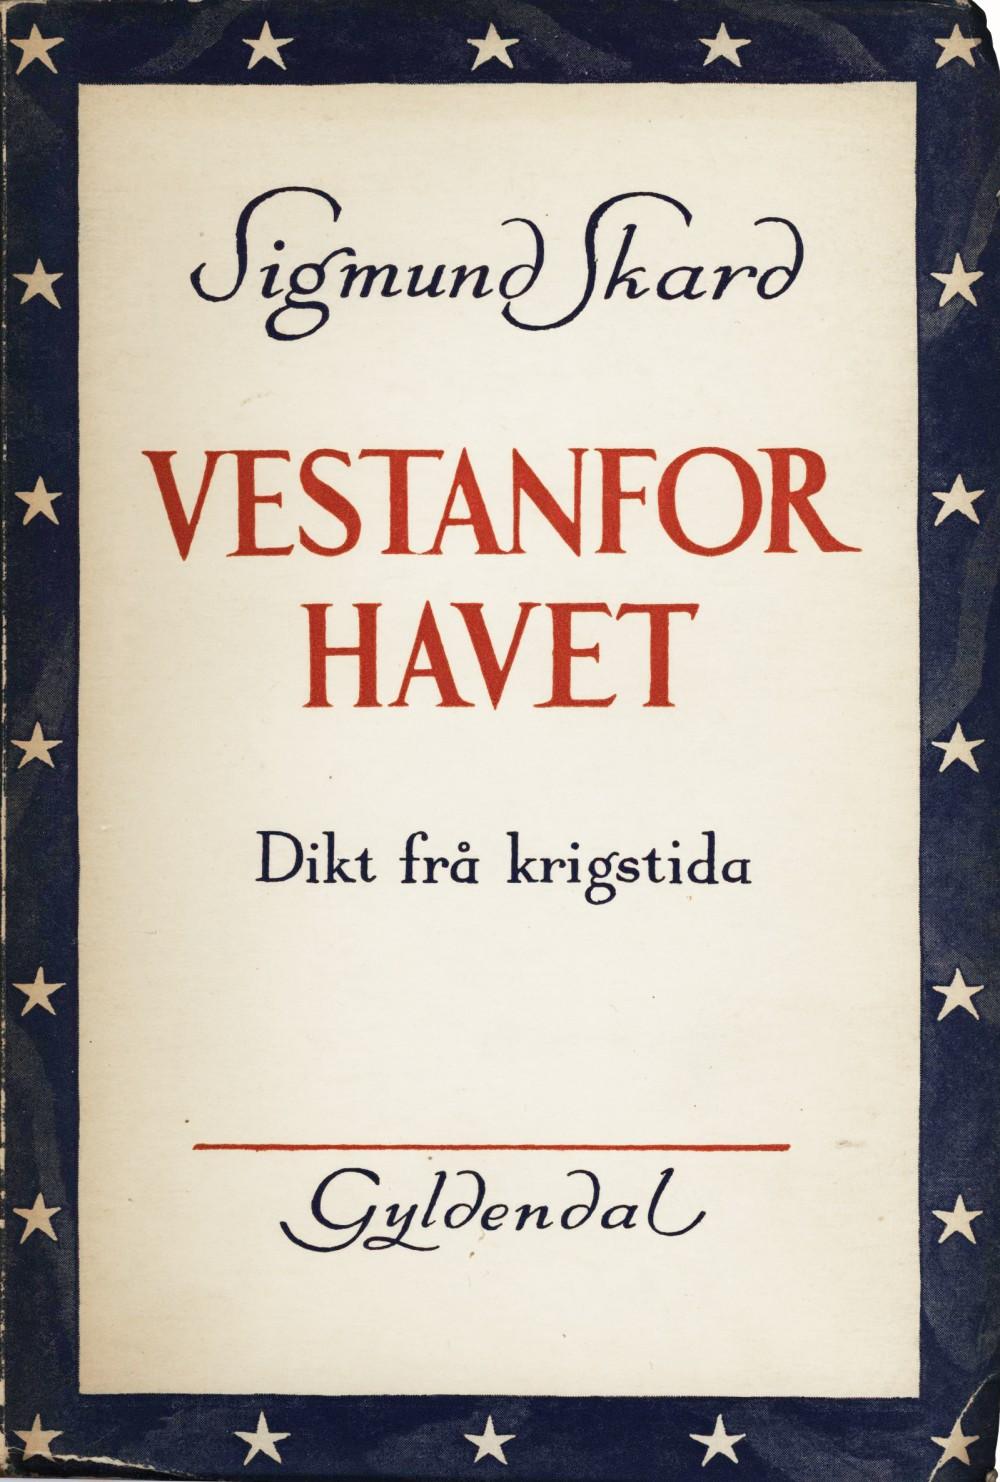 Sigmund Skard: Vestanfor havet - Dikt frå krigstida